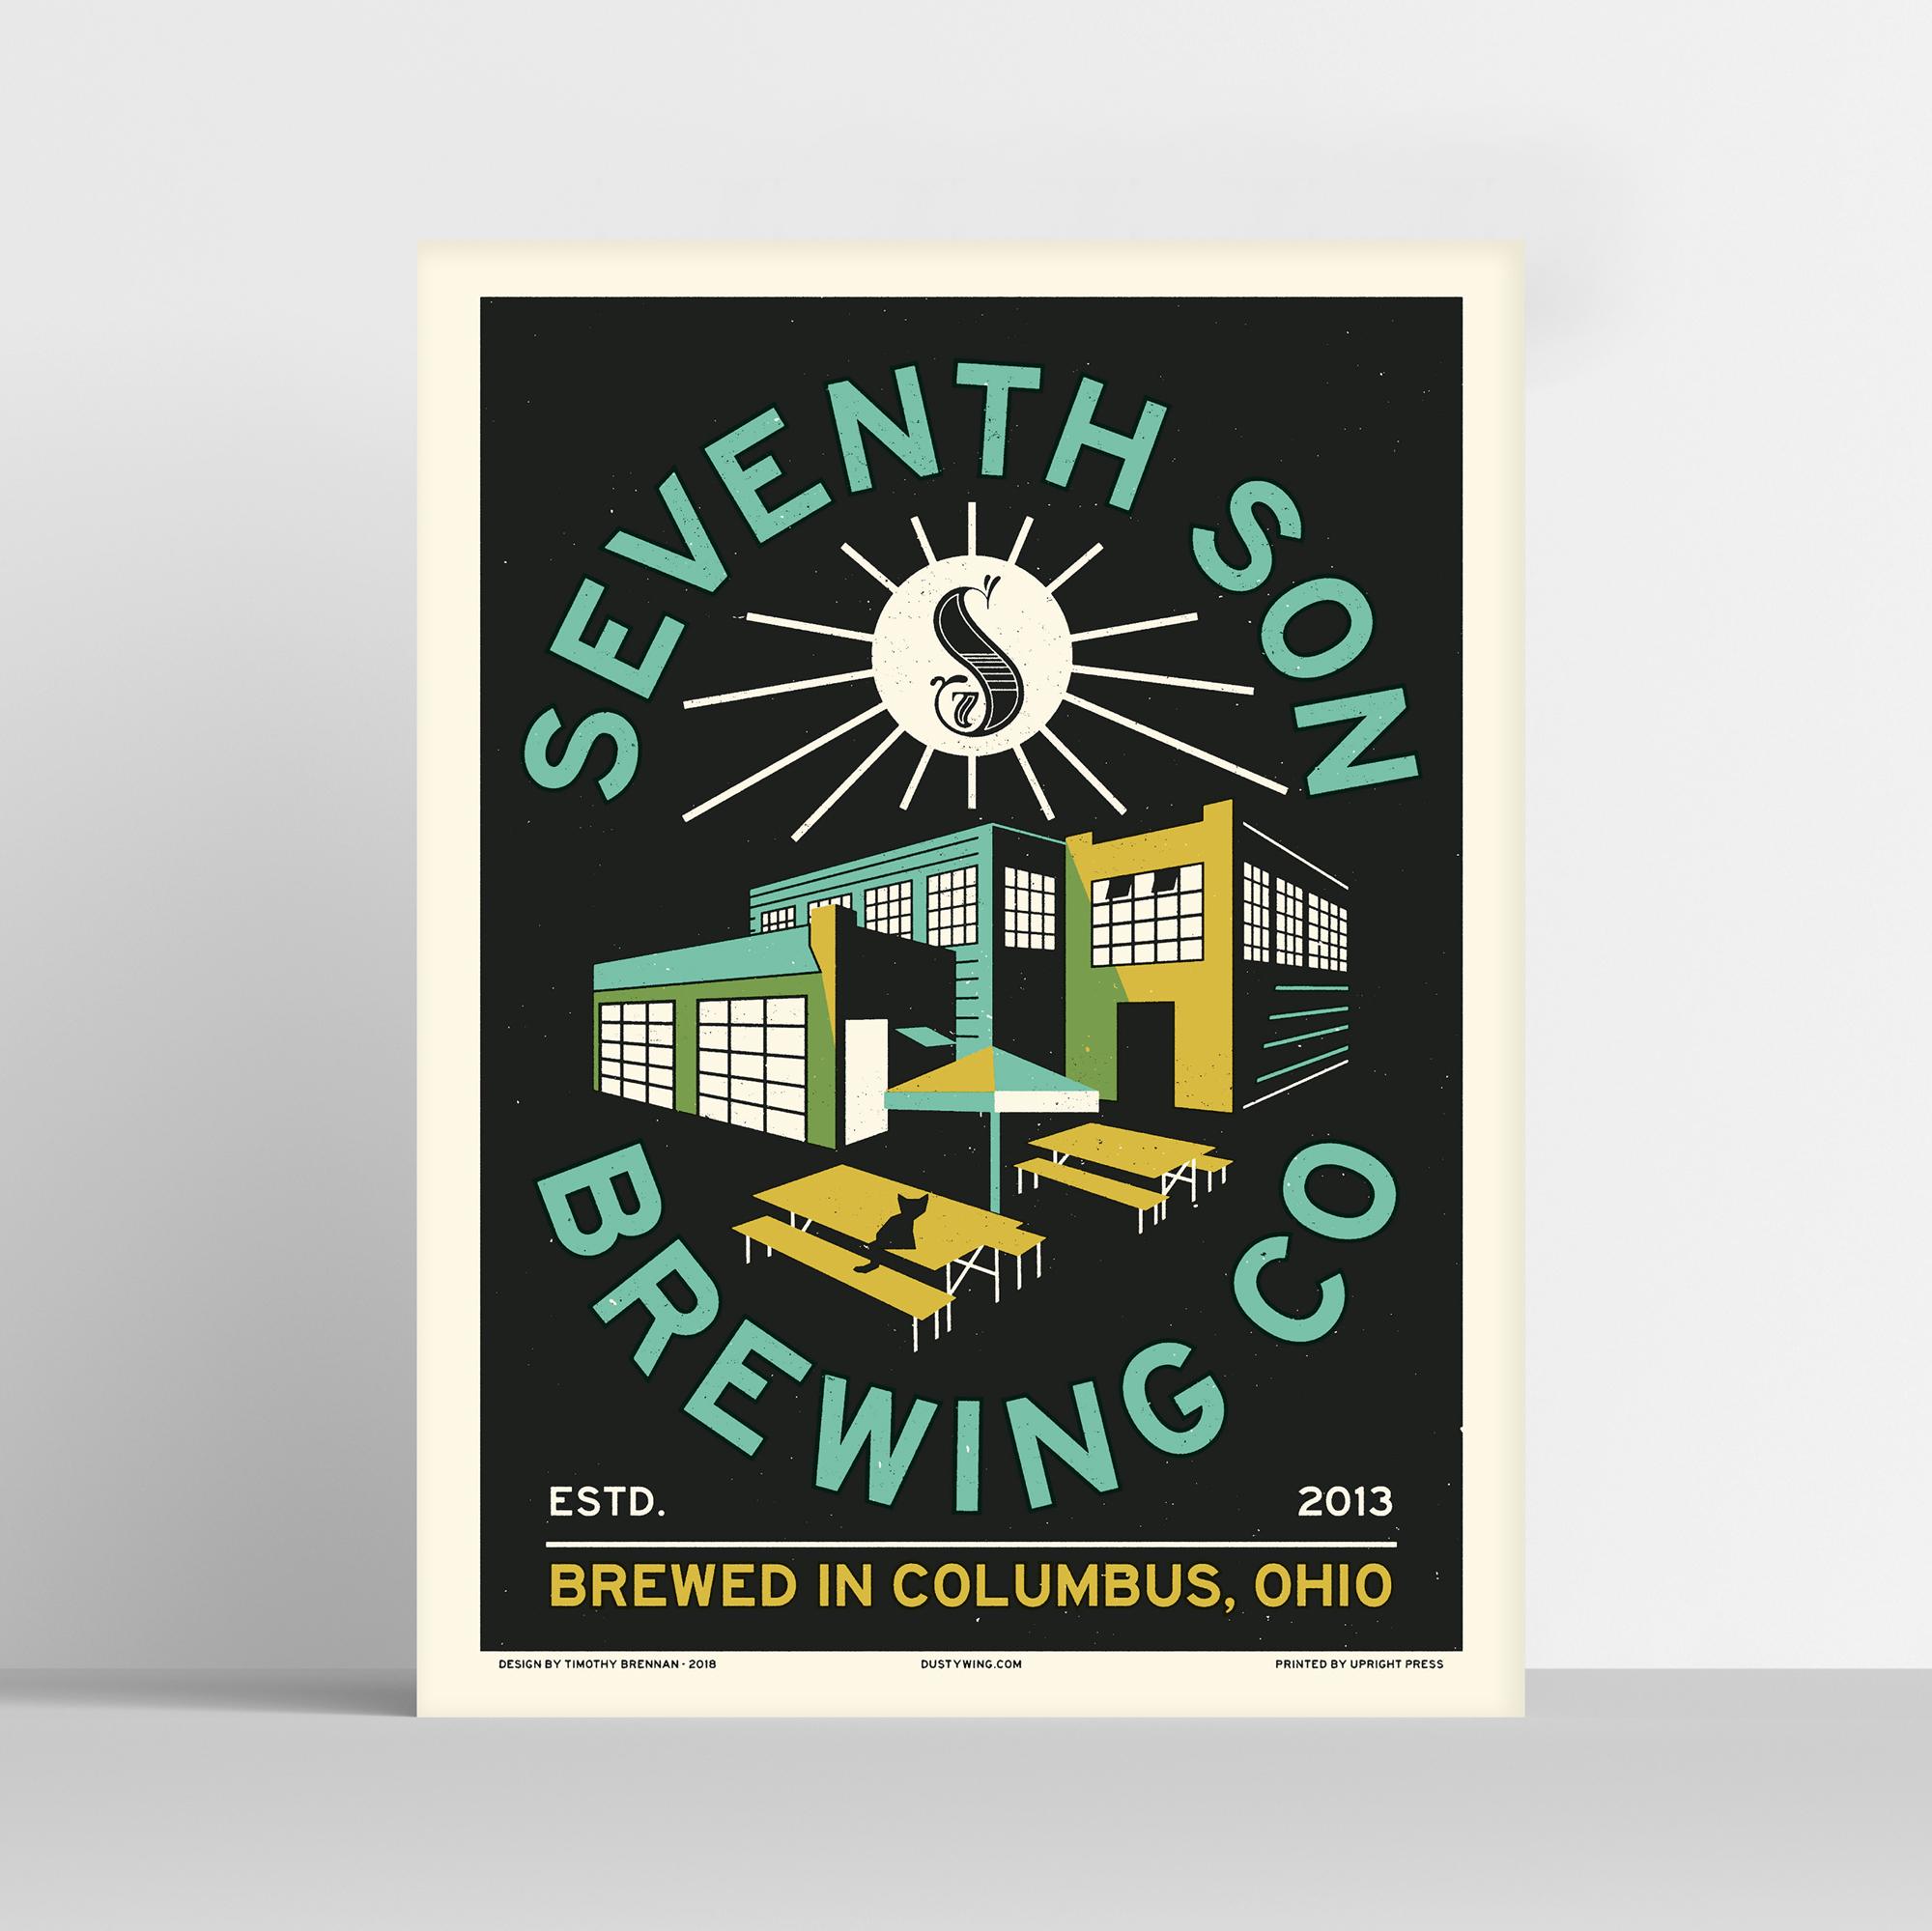 TB_Seventh-Son-Brewing_Poster_mockup_square-2.jpg